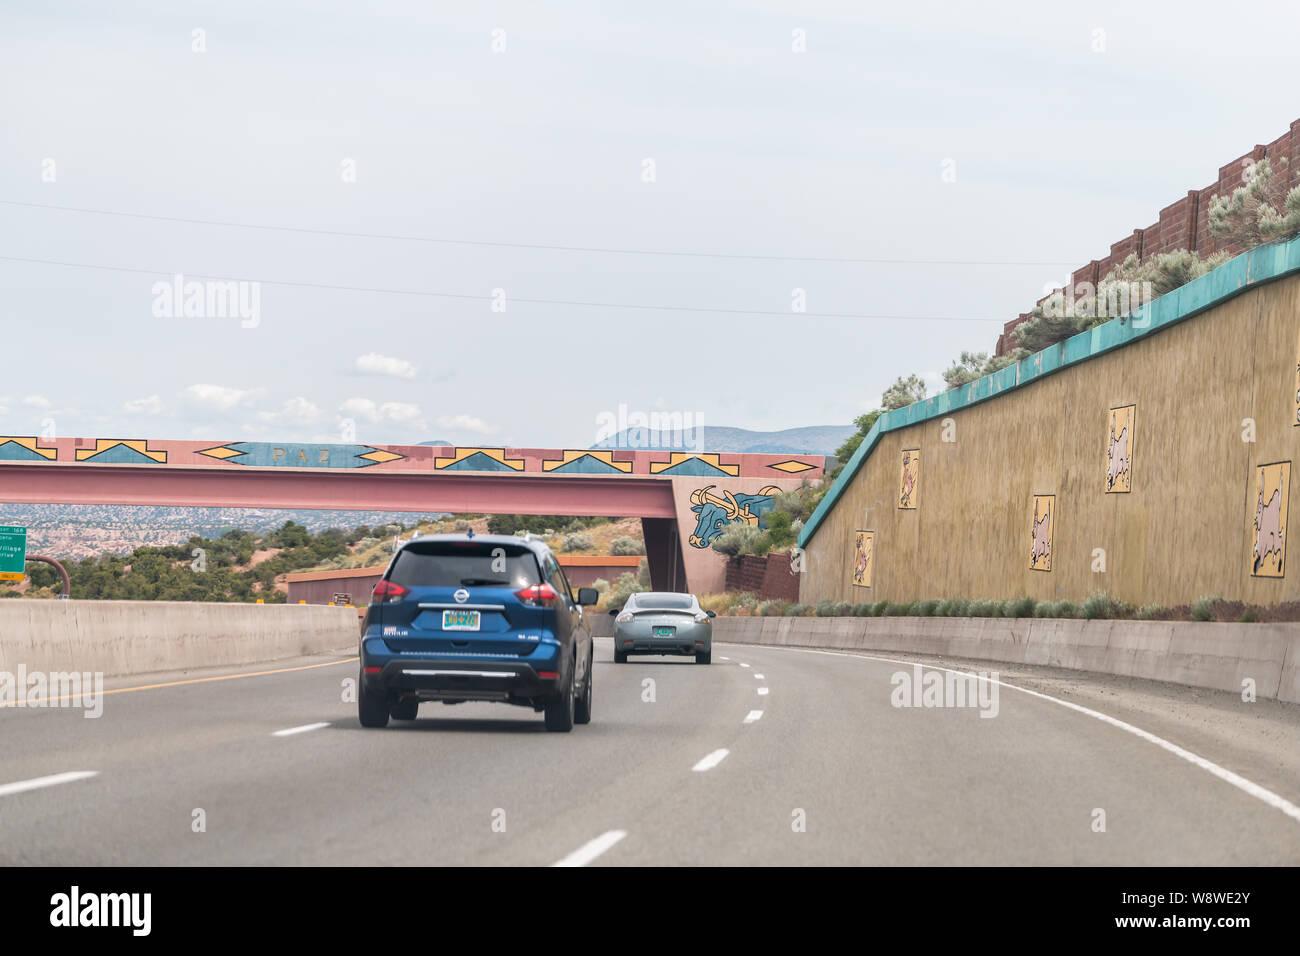 Santa Fe, USA - June 17, 2019: Road US Highway 285 in New